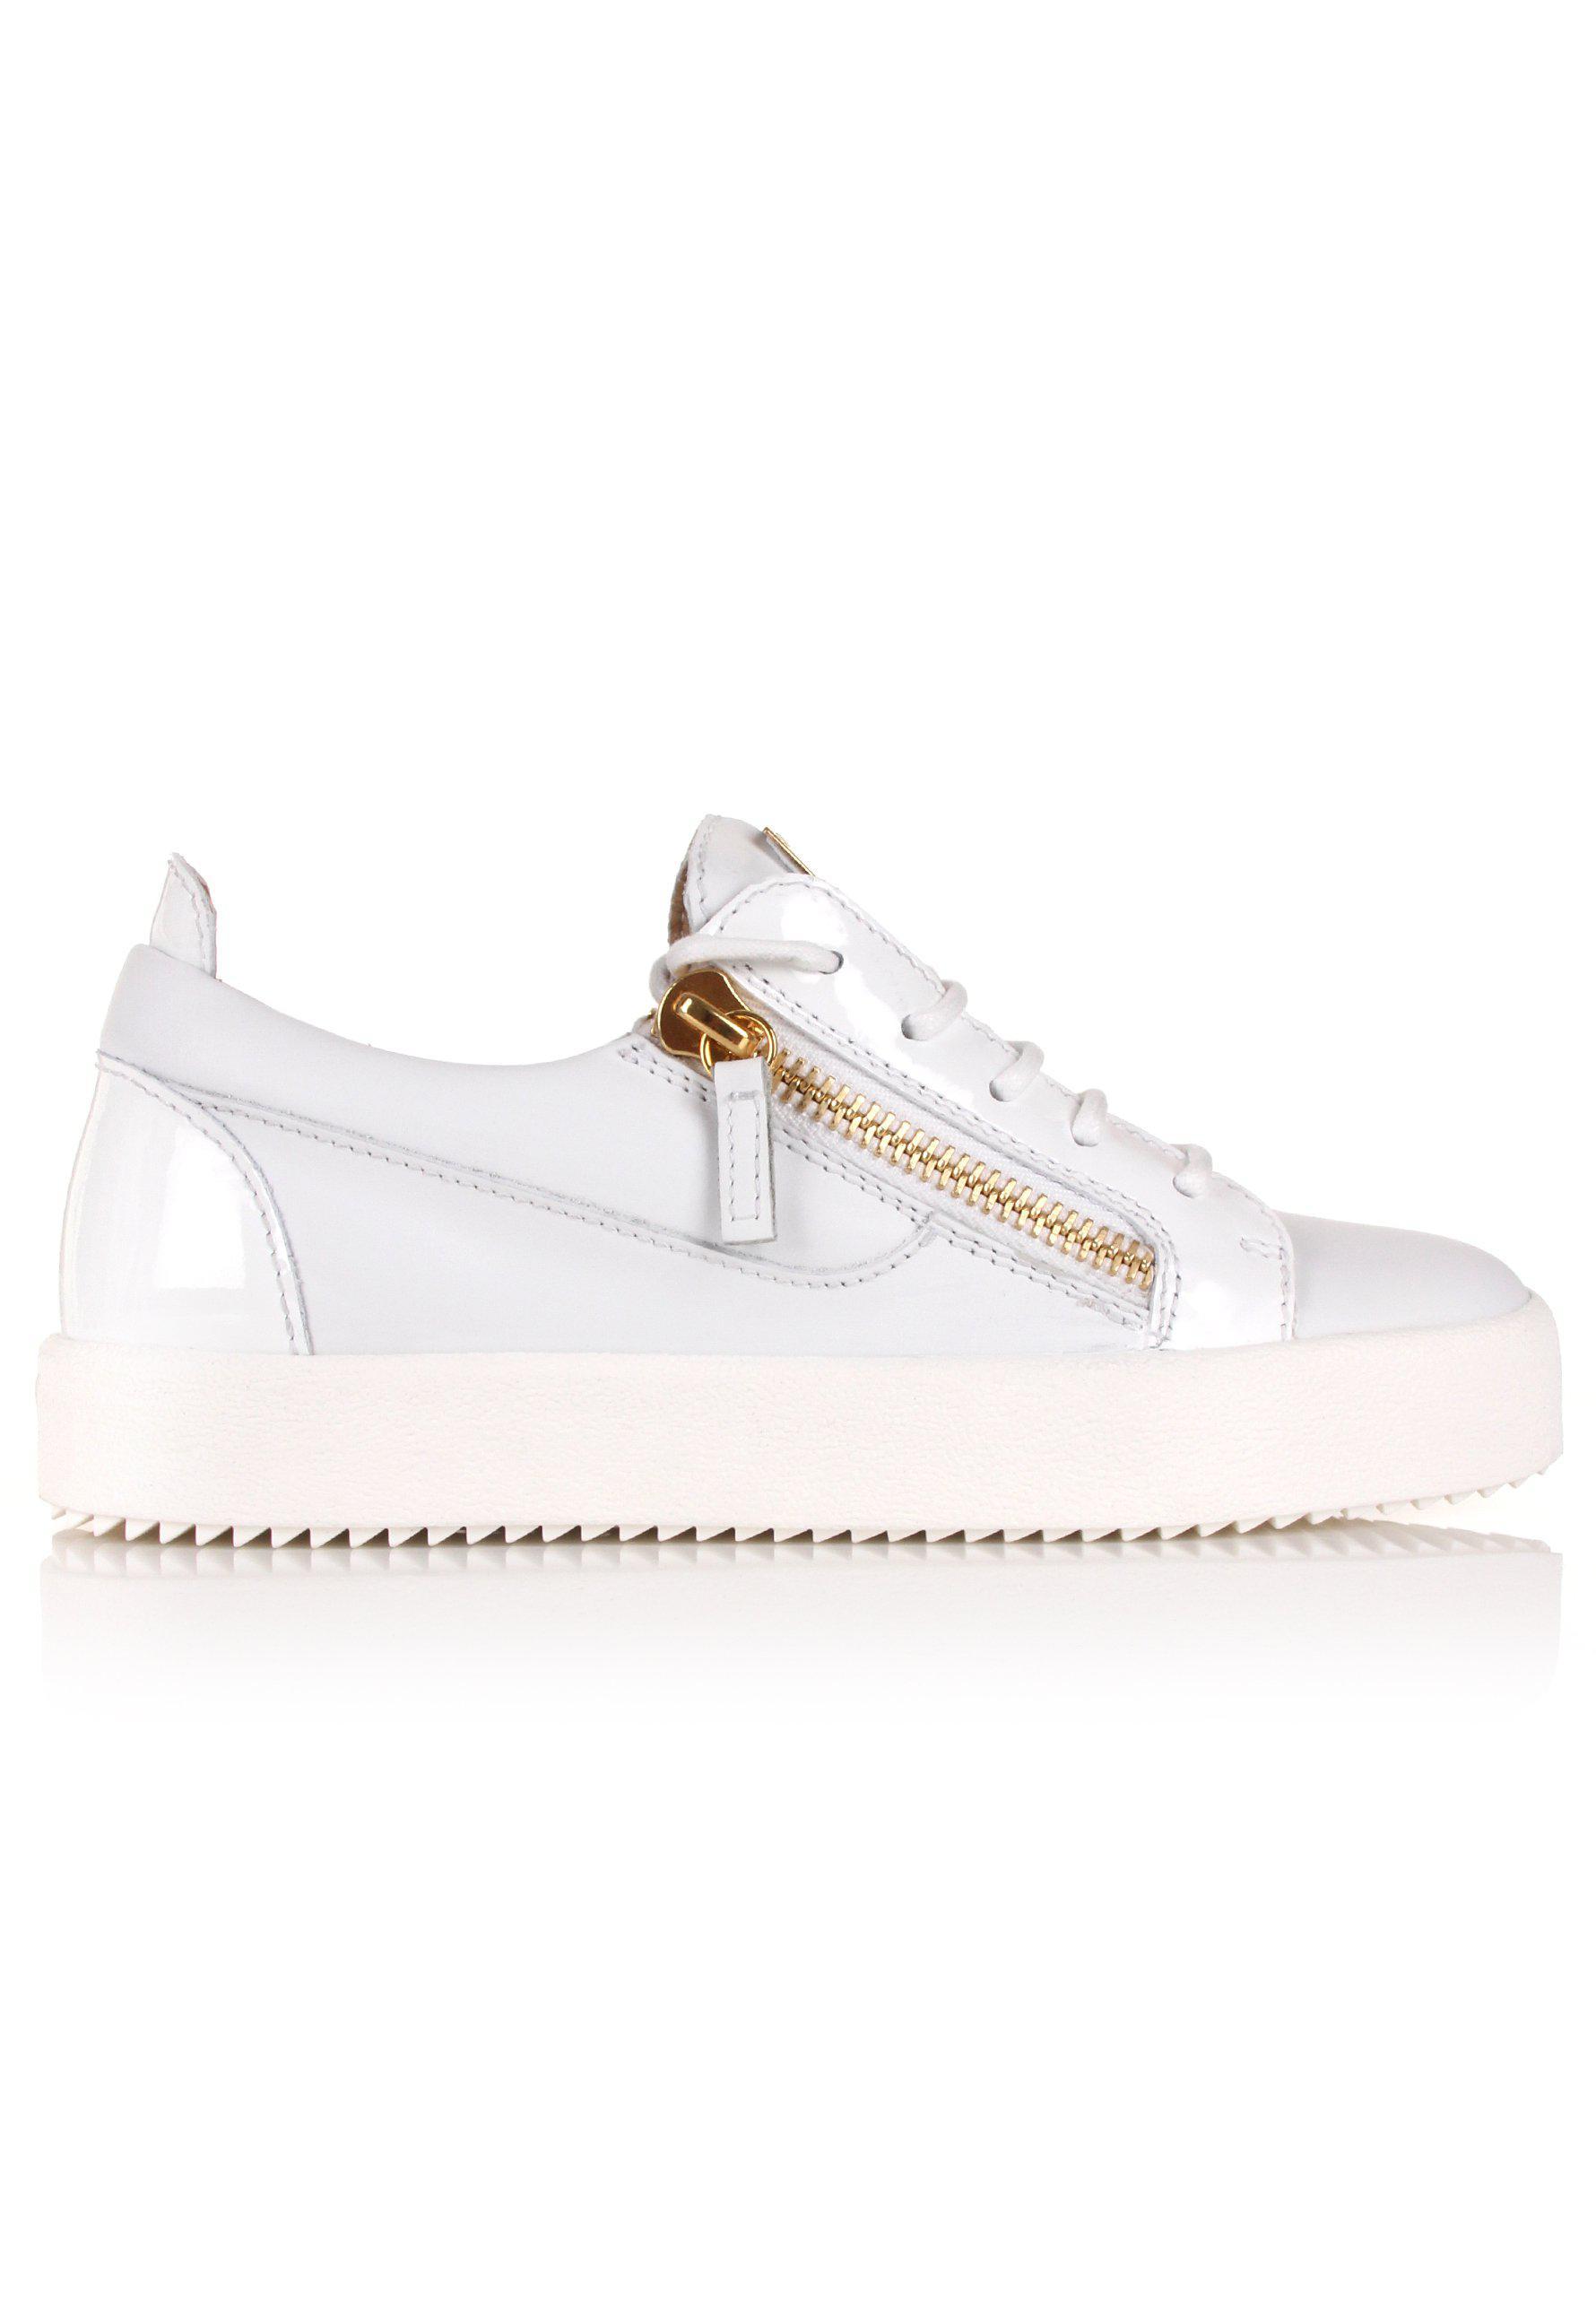 cbe00f60665a4 Giuseppe Zanotti Nicki Low-top Sneakers White/gold in White - Lyst